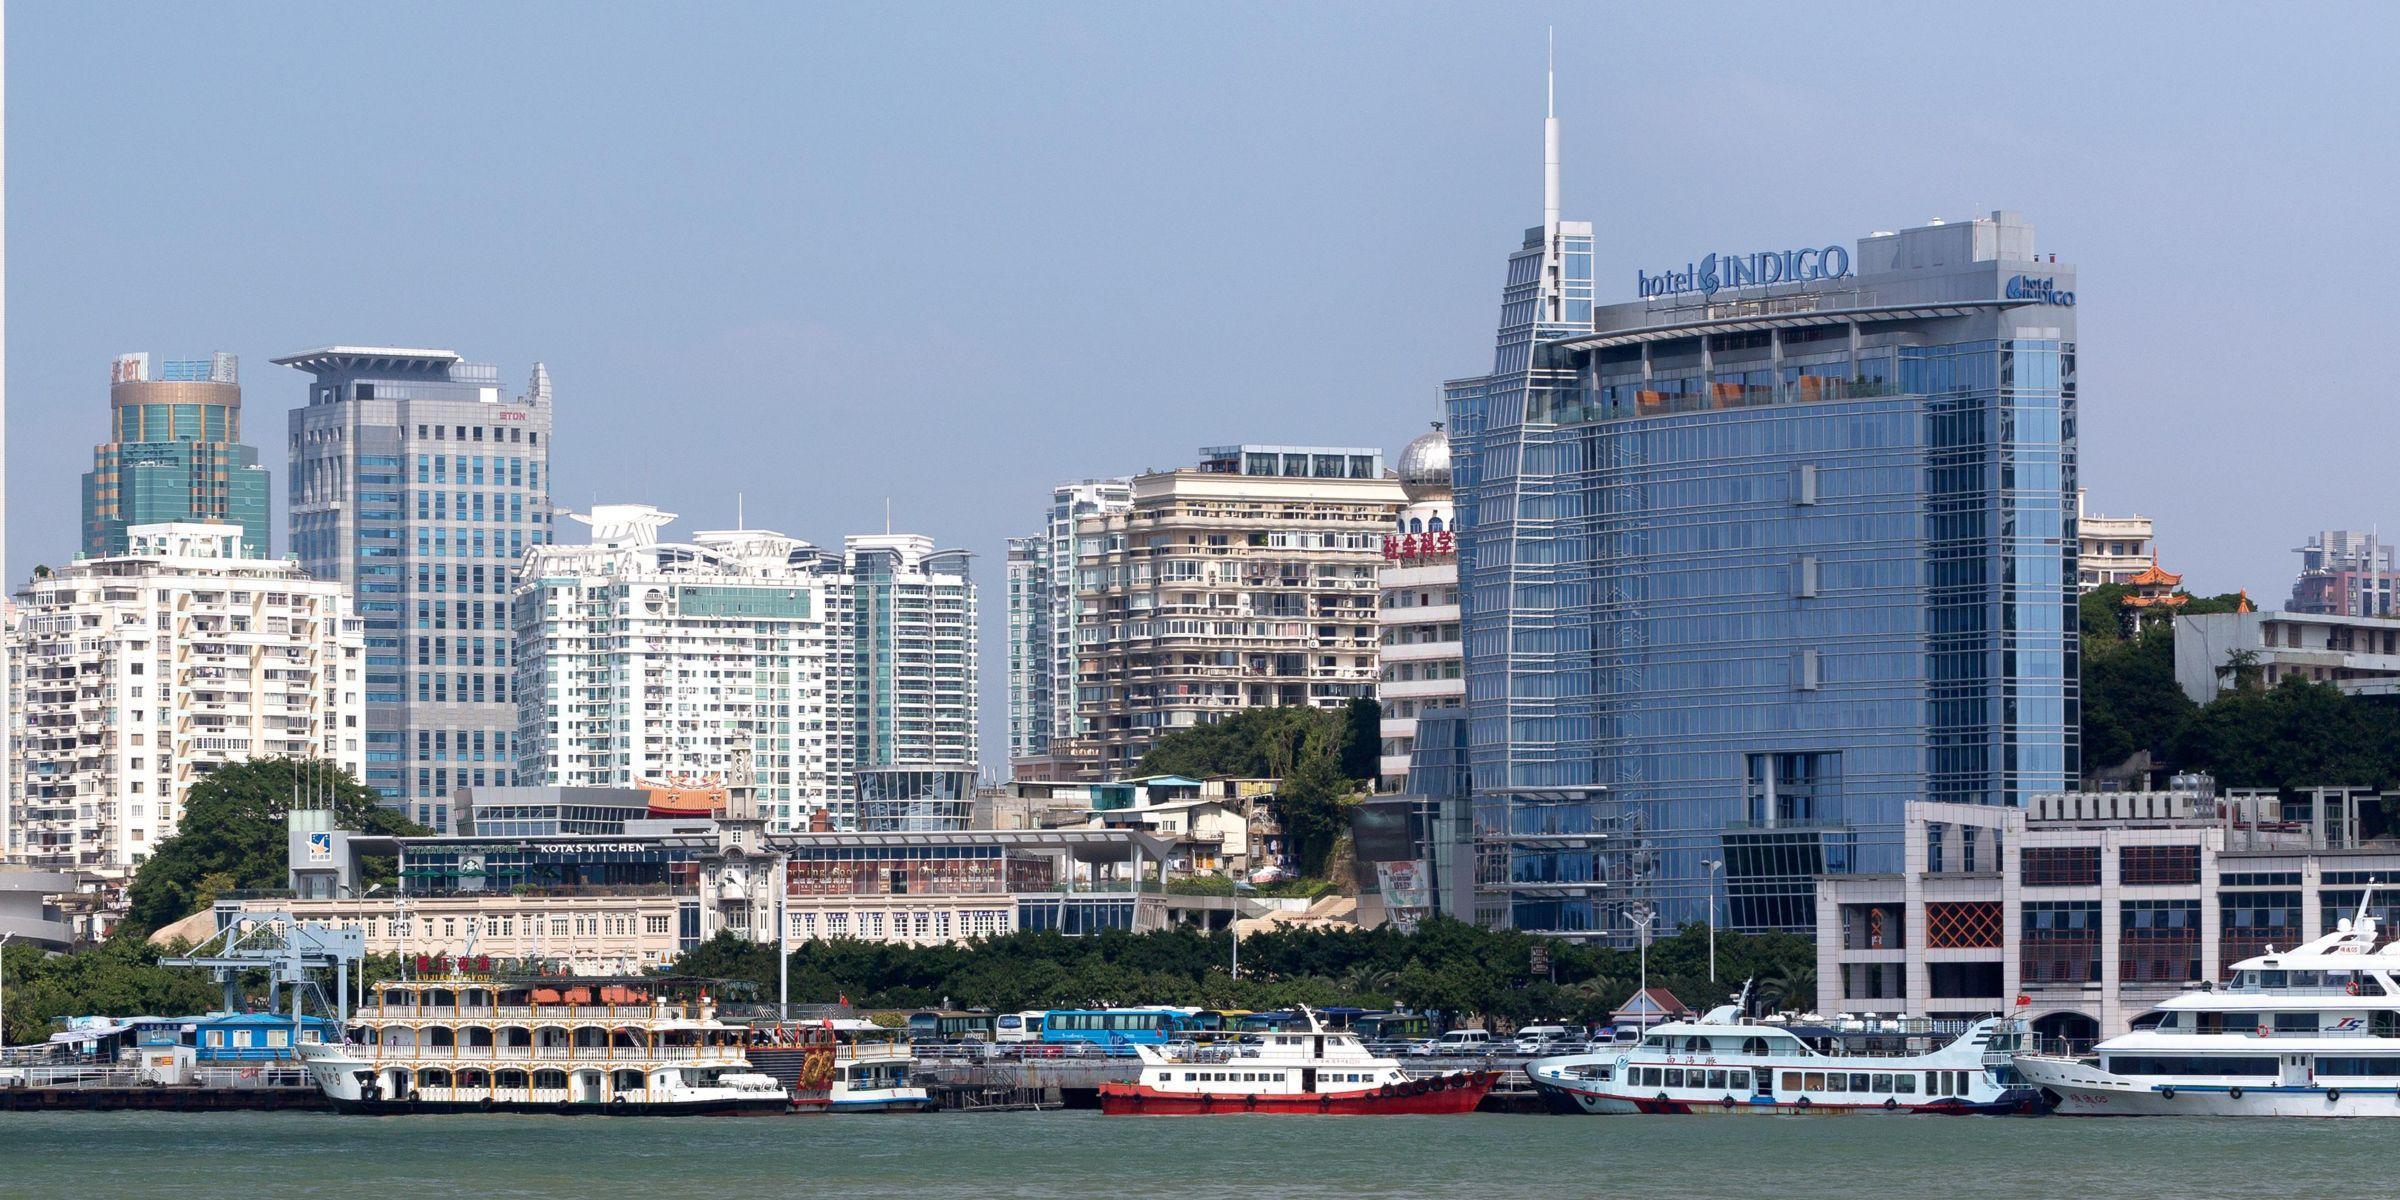 Hotel Xiamen Indigo Harbour Di Fj Tiket Masuk Sky 100 Hongkong Anak Exterior